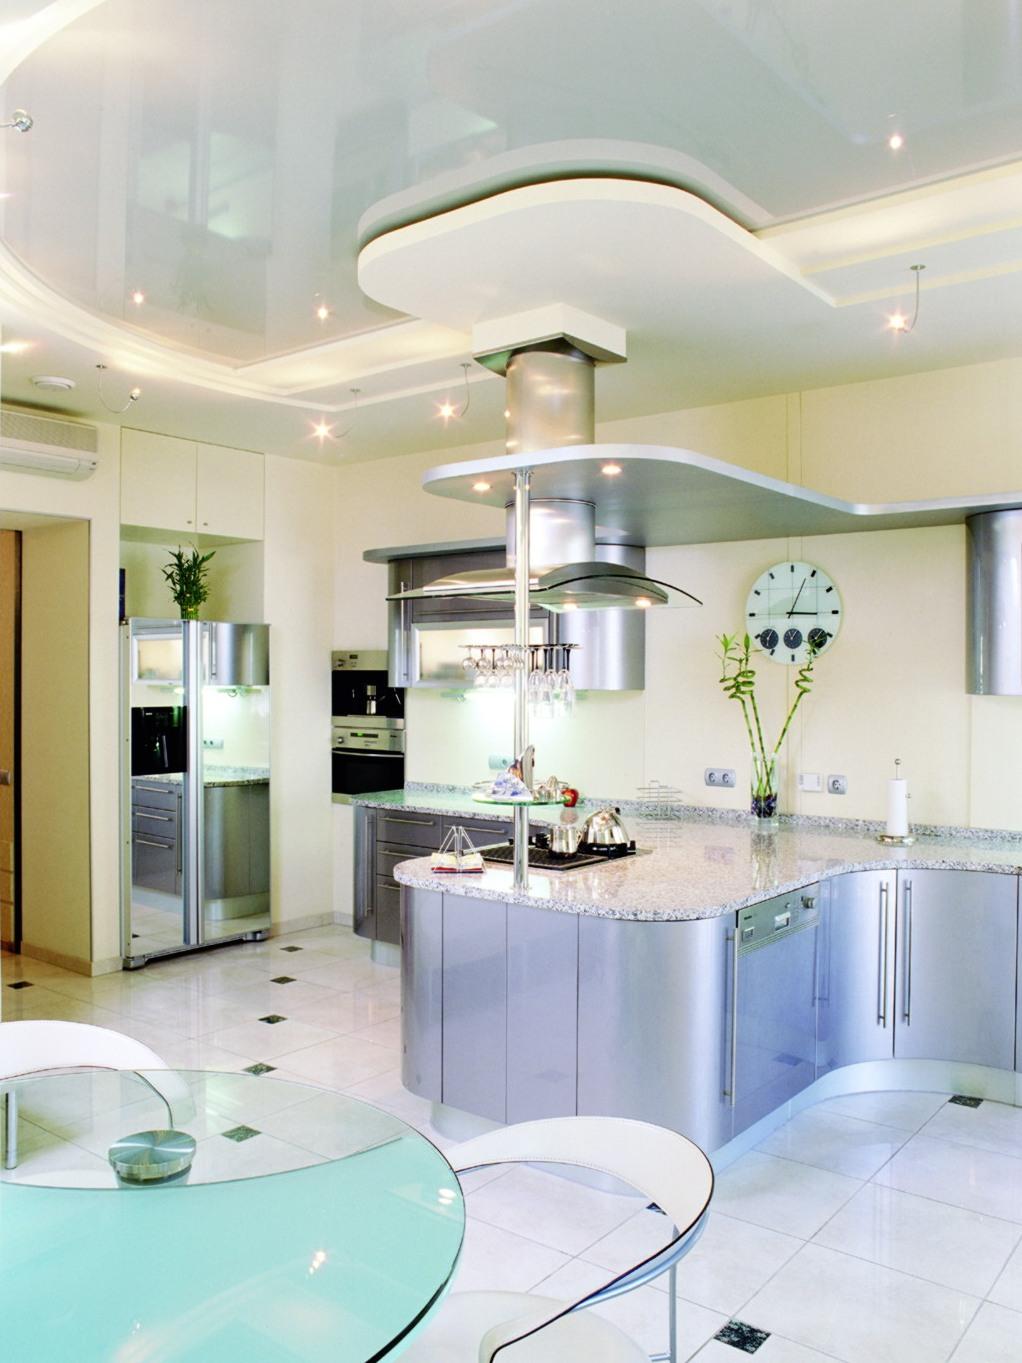 дизайн потолков на кухне: womanadvice.ru/dizayn-potolkov-na-kuhne